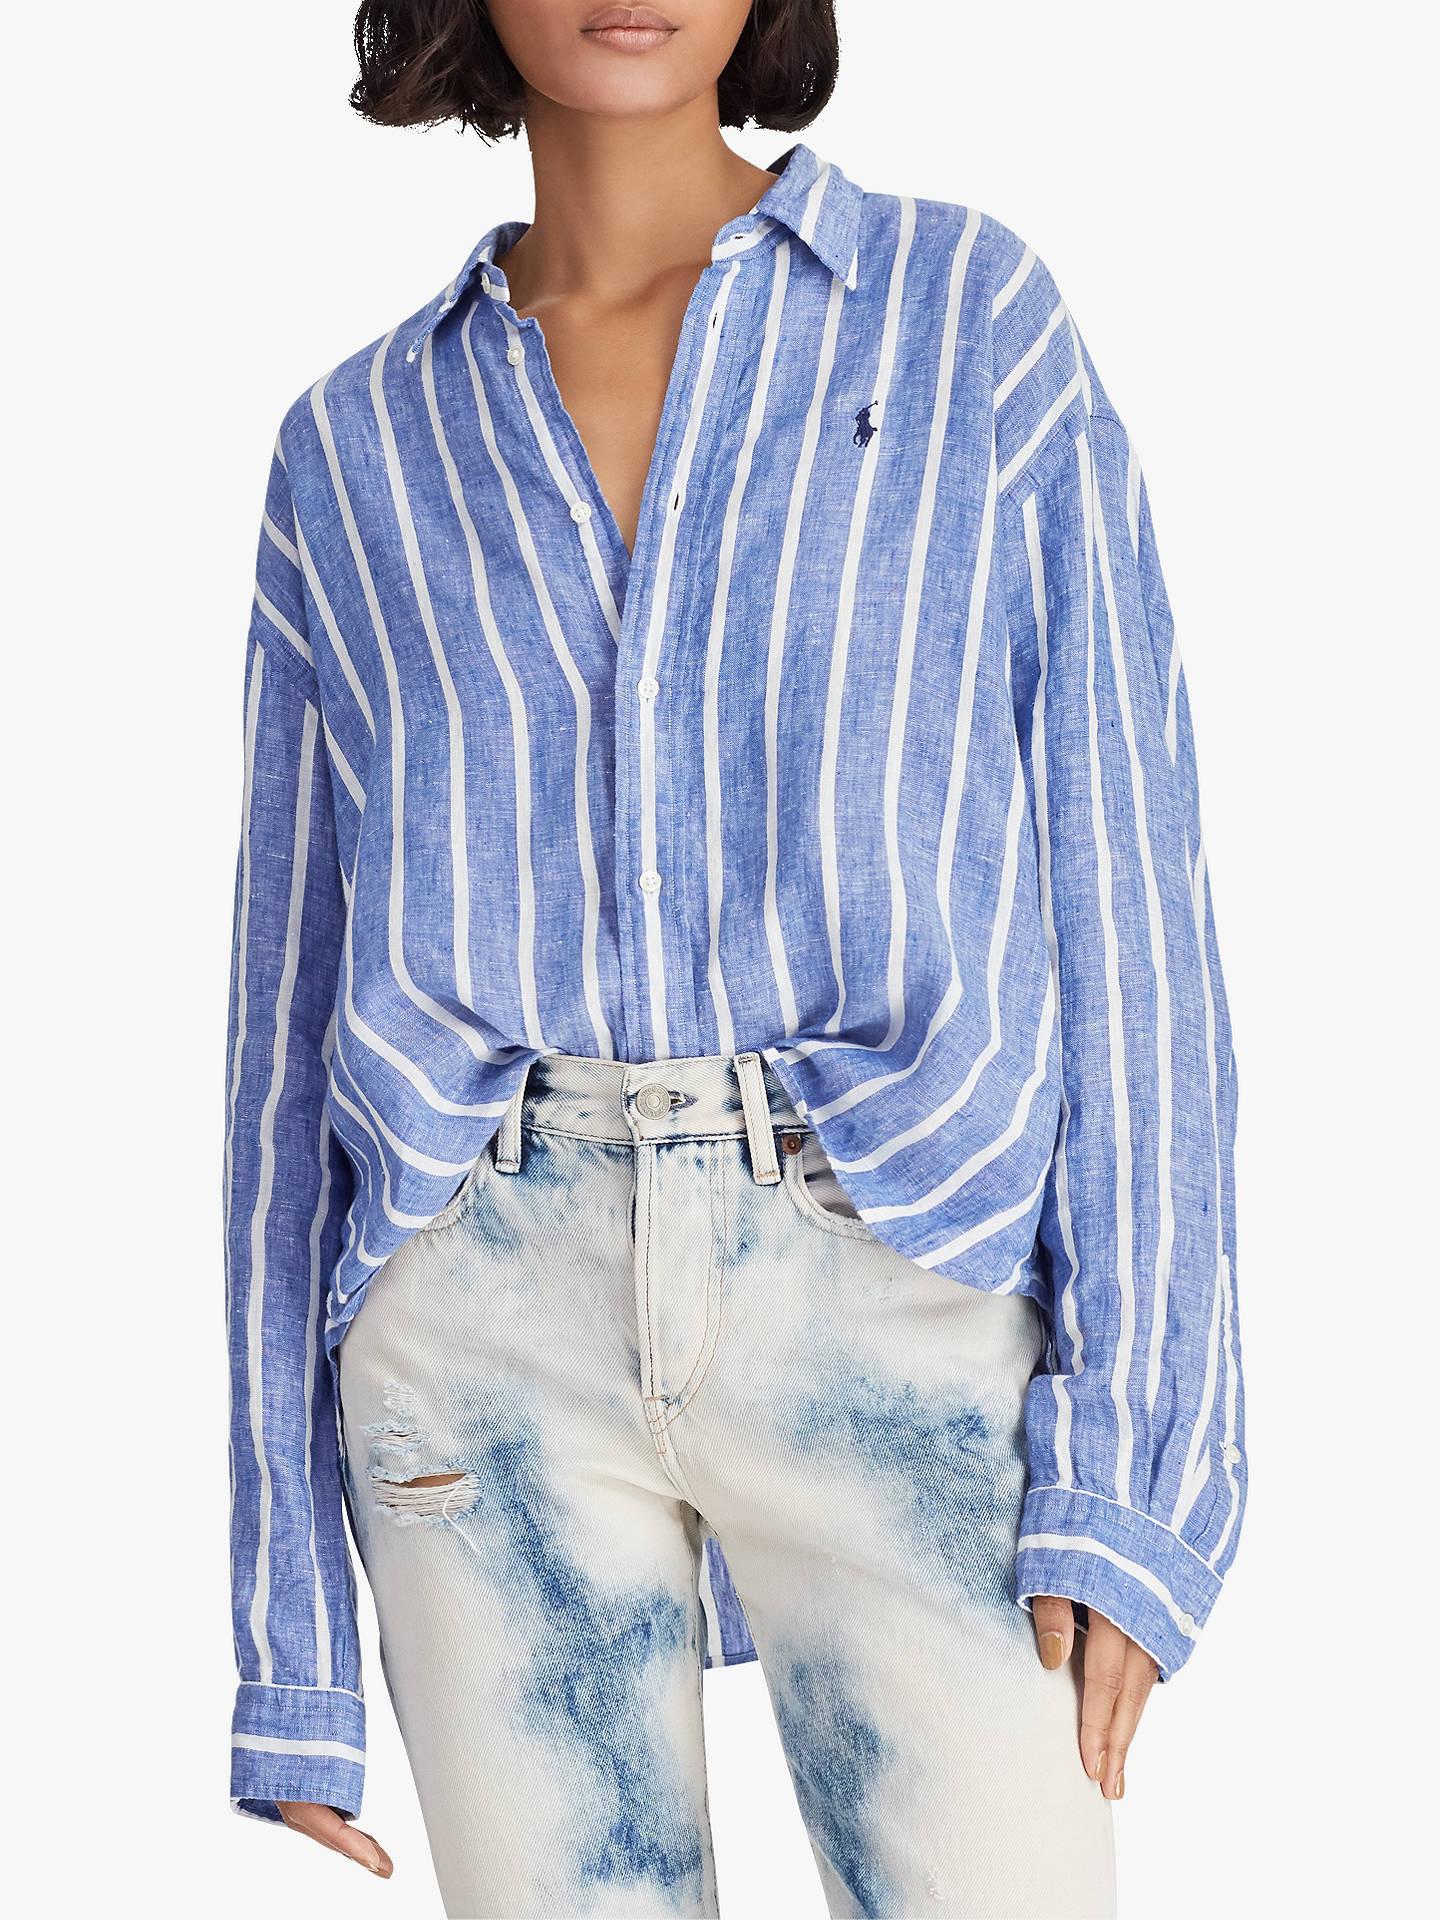 b0557530bac75 Buy Polo Ralph Lauren Wide Stripe Cropped Linen Oxford Shirt